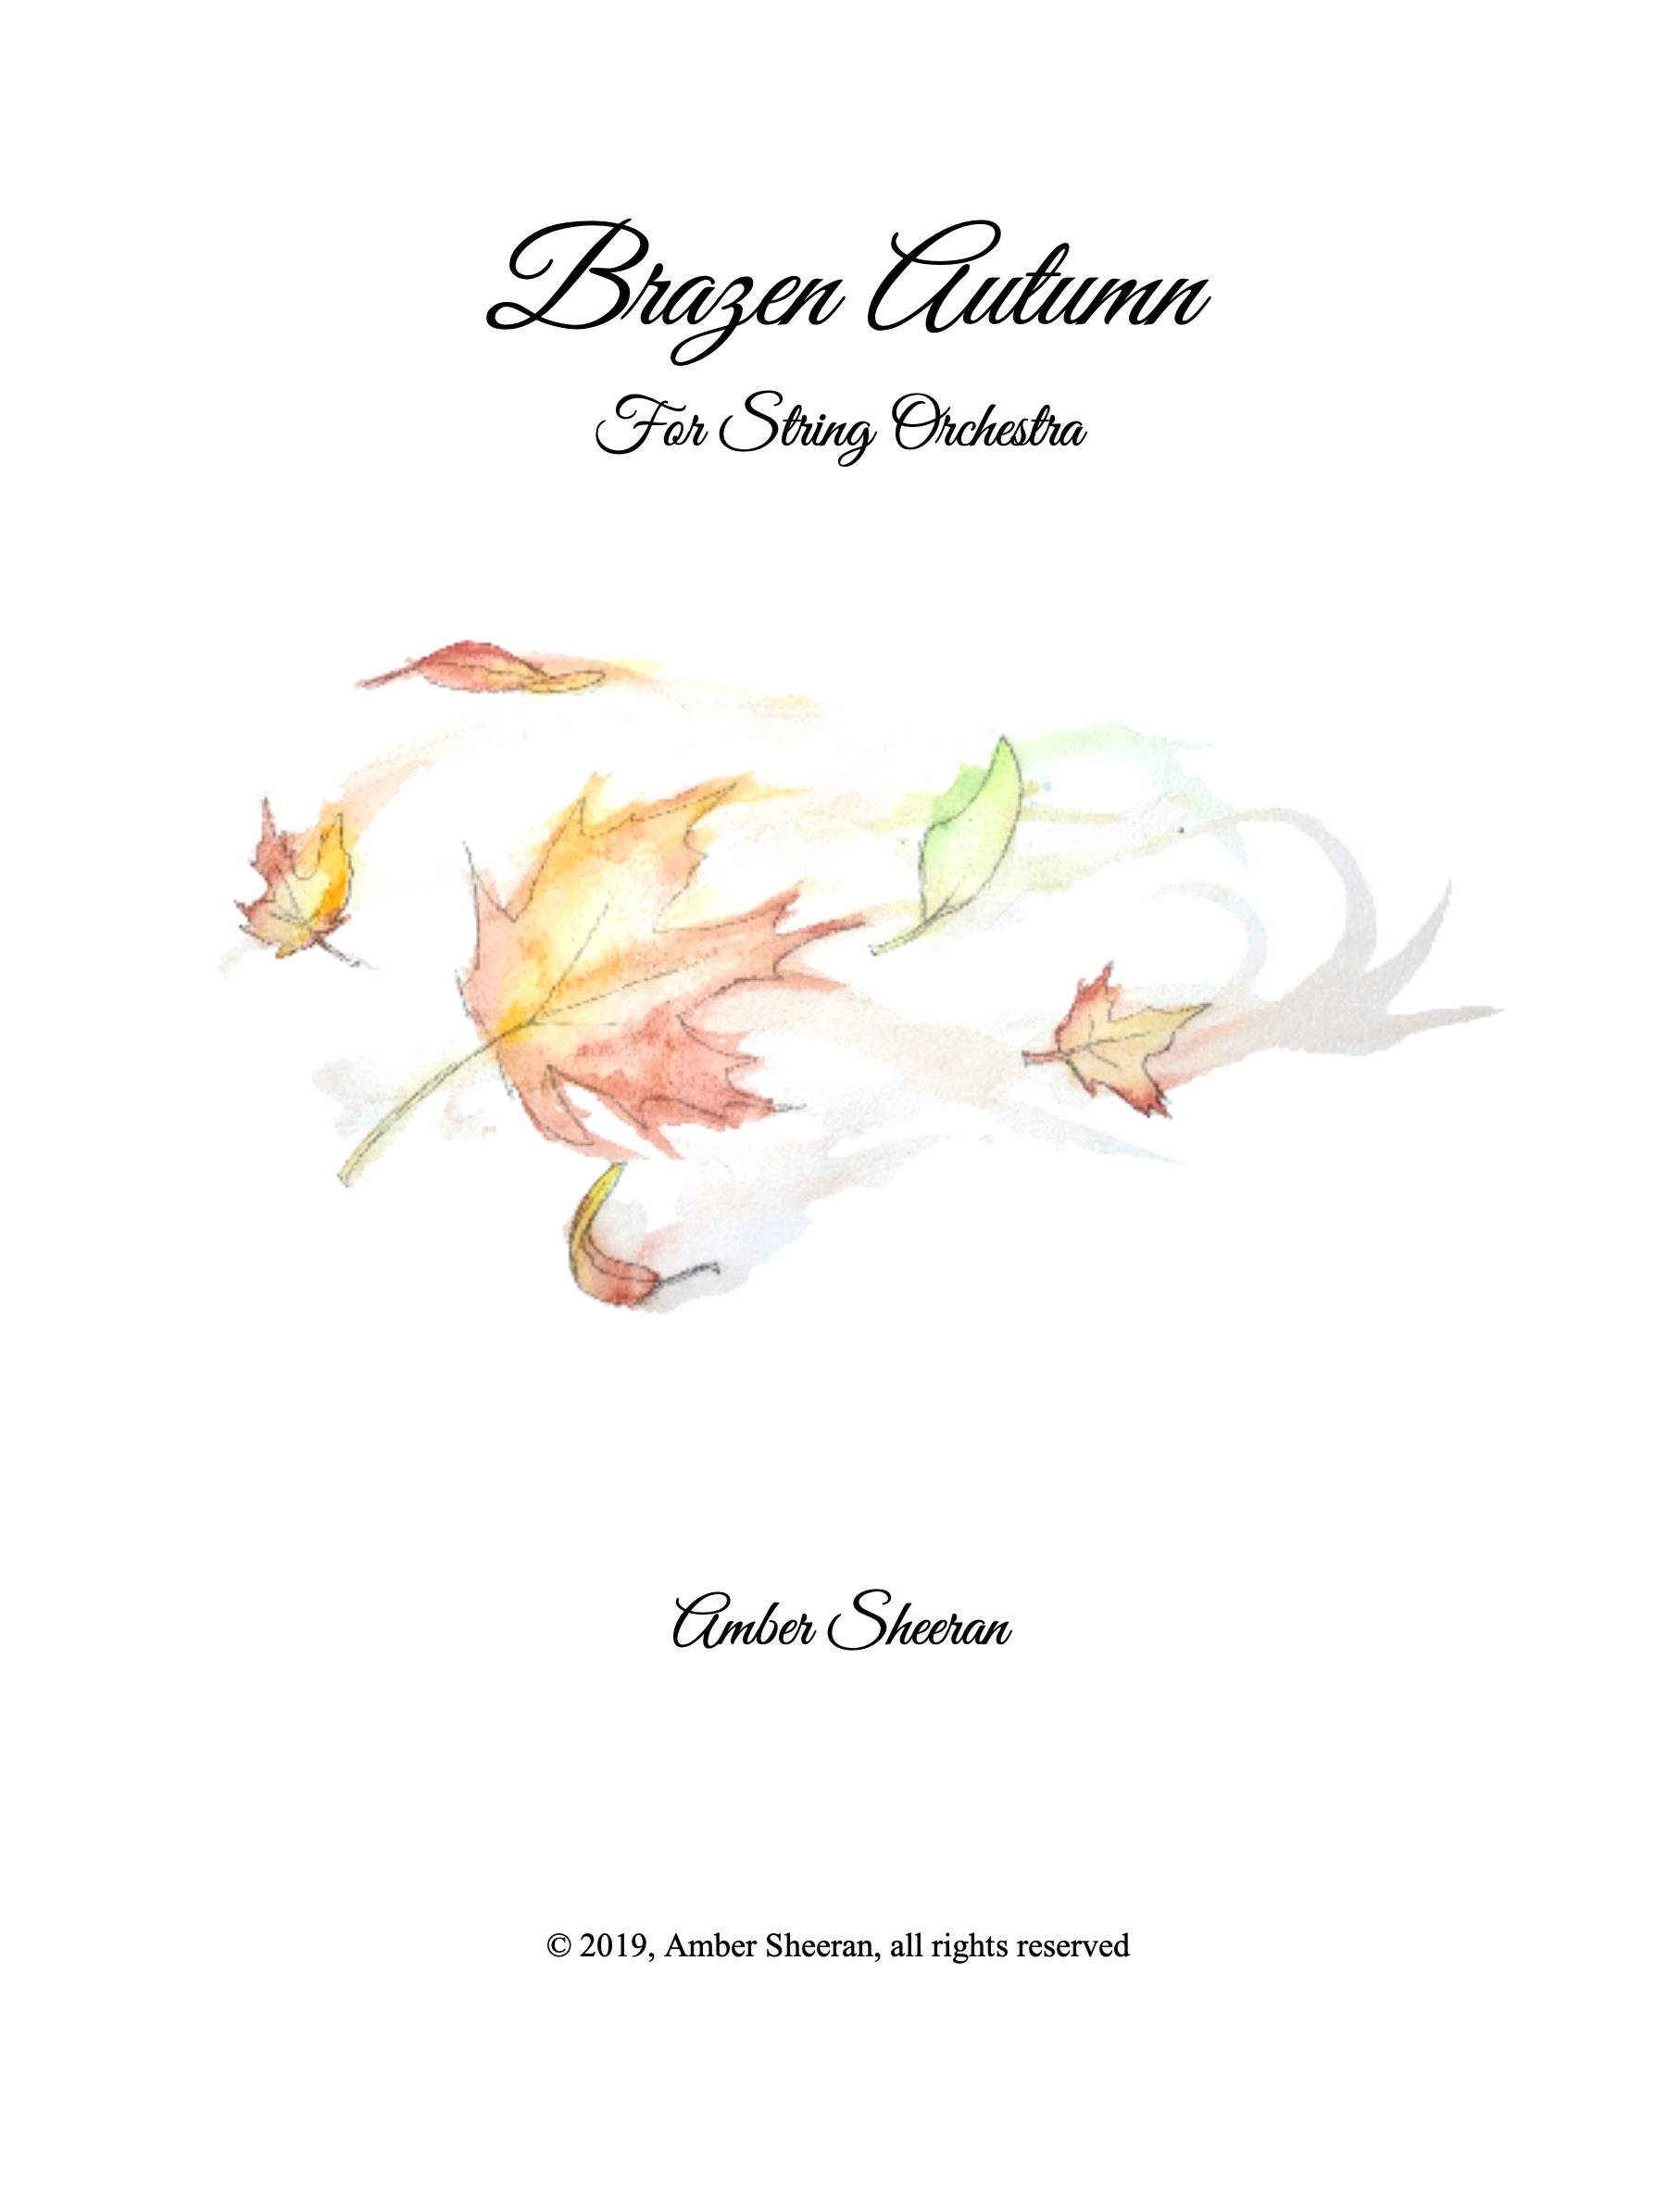 Brazen Autumn by Amber Sheeran